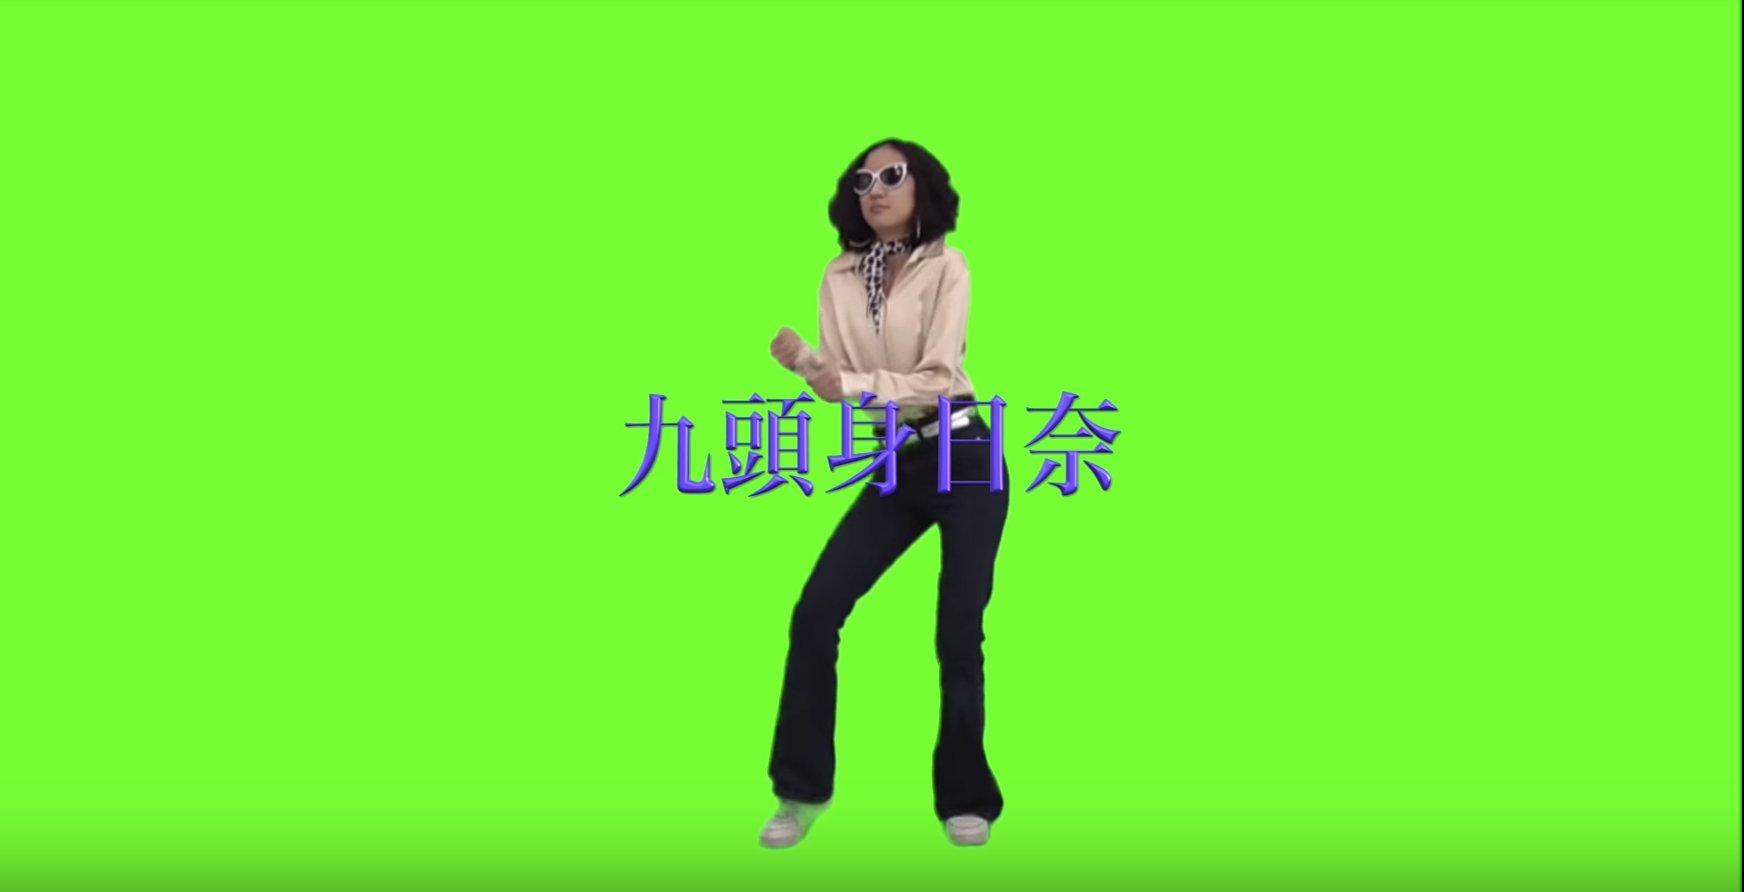 e89ea2e5b995e5bfabe785a7 2018 01 22 e4b88be58d886 46 39 - 連水原希子都成為迷妹追星粉,她是台灣爵士新女聲「9m88」